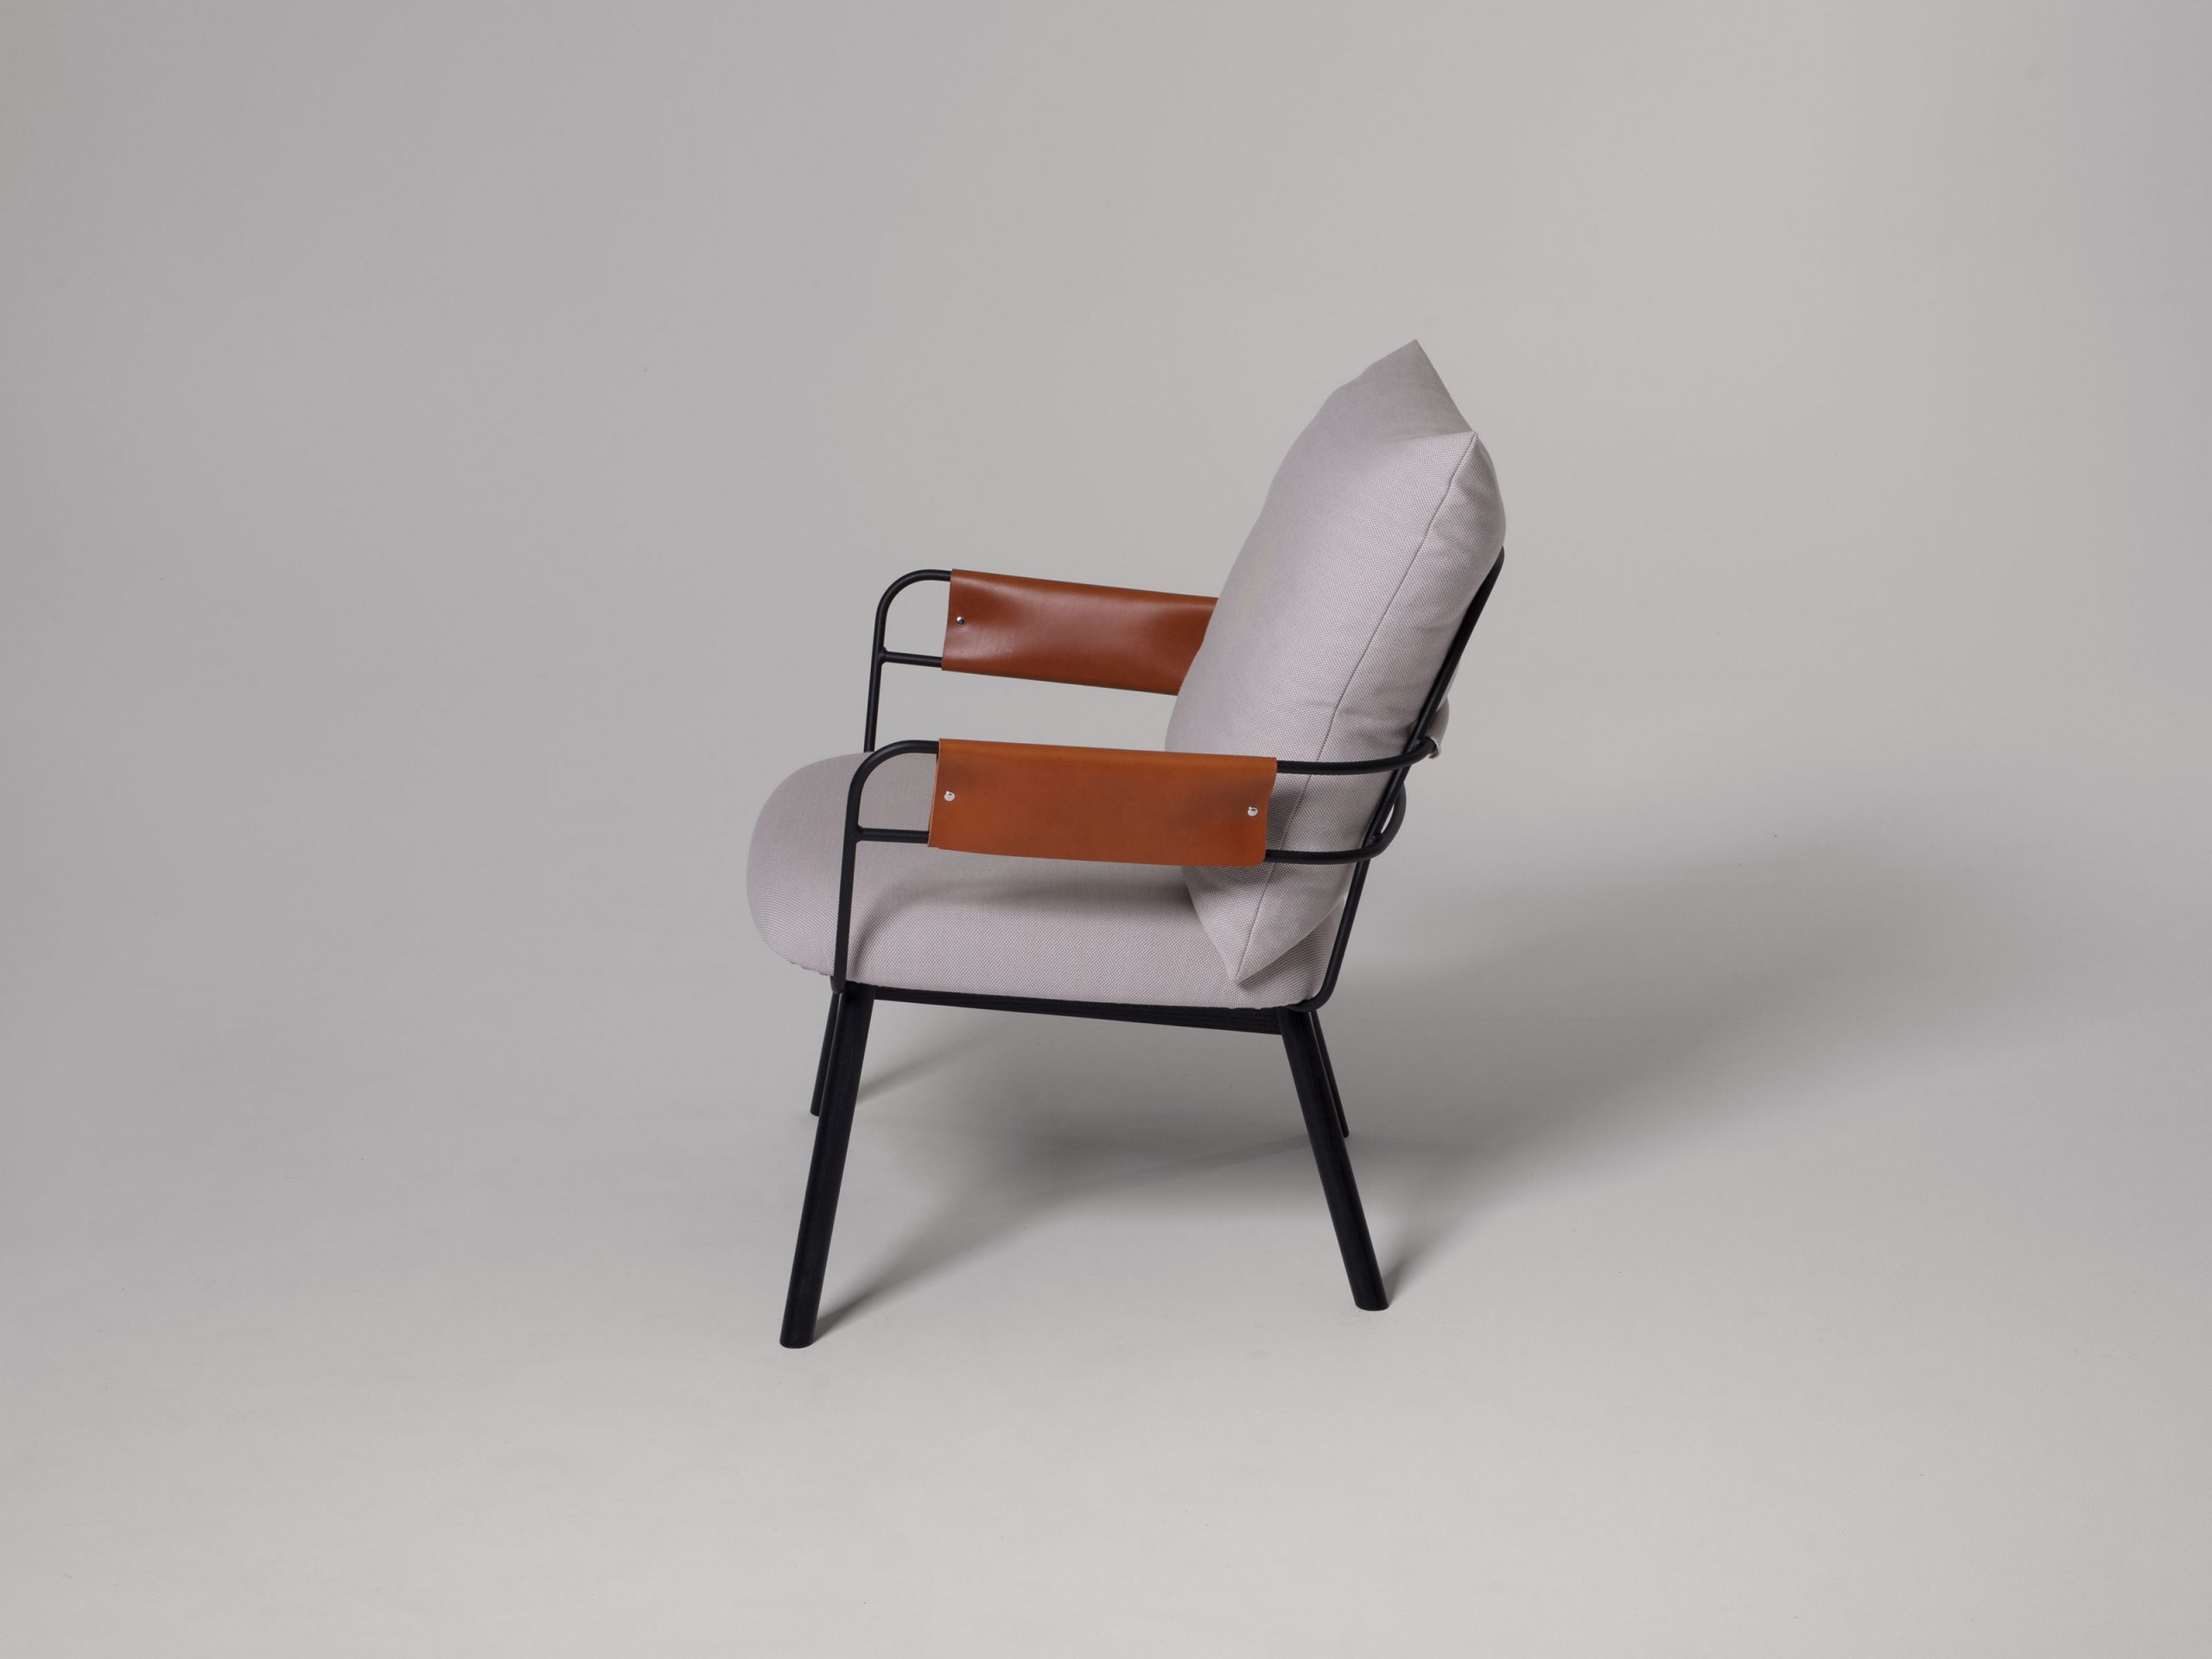 https://www.minustio.se/wp-content/uploads/2021/03/Darling-Lounge-Wooden-Base-Black-2-scaled.jpg